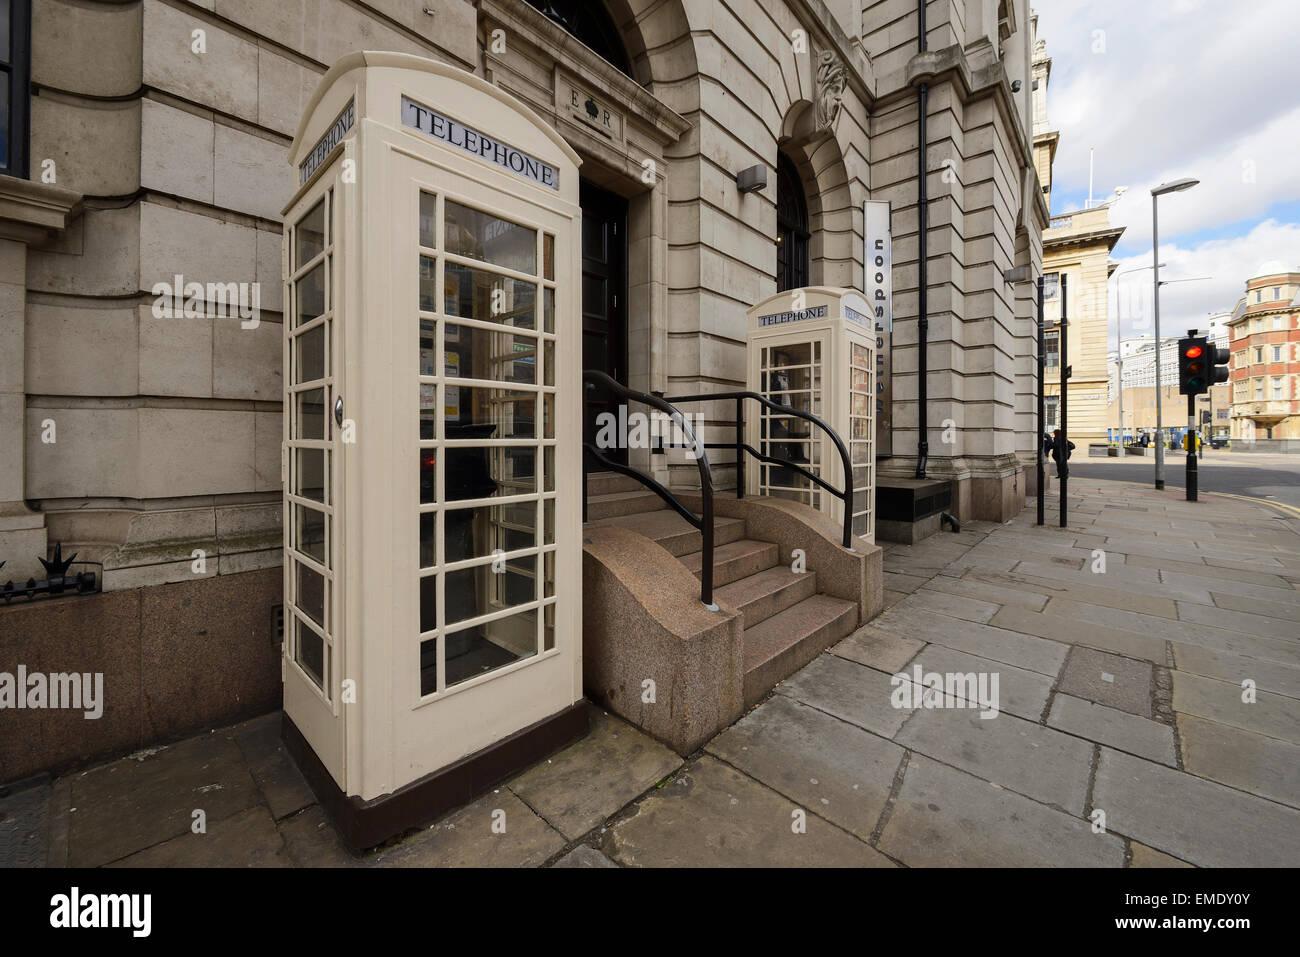 Kingston nach Rumpf weiß Telefonzellen Stockbild